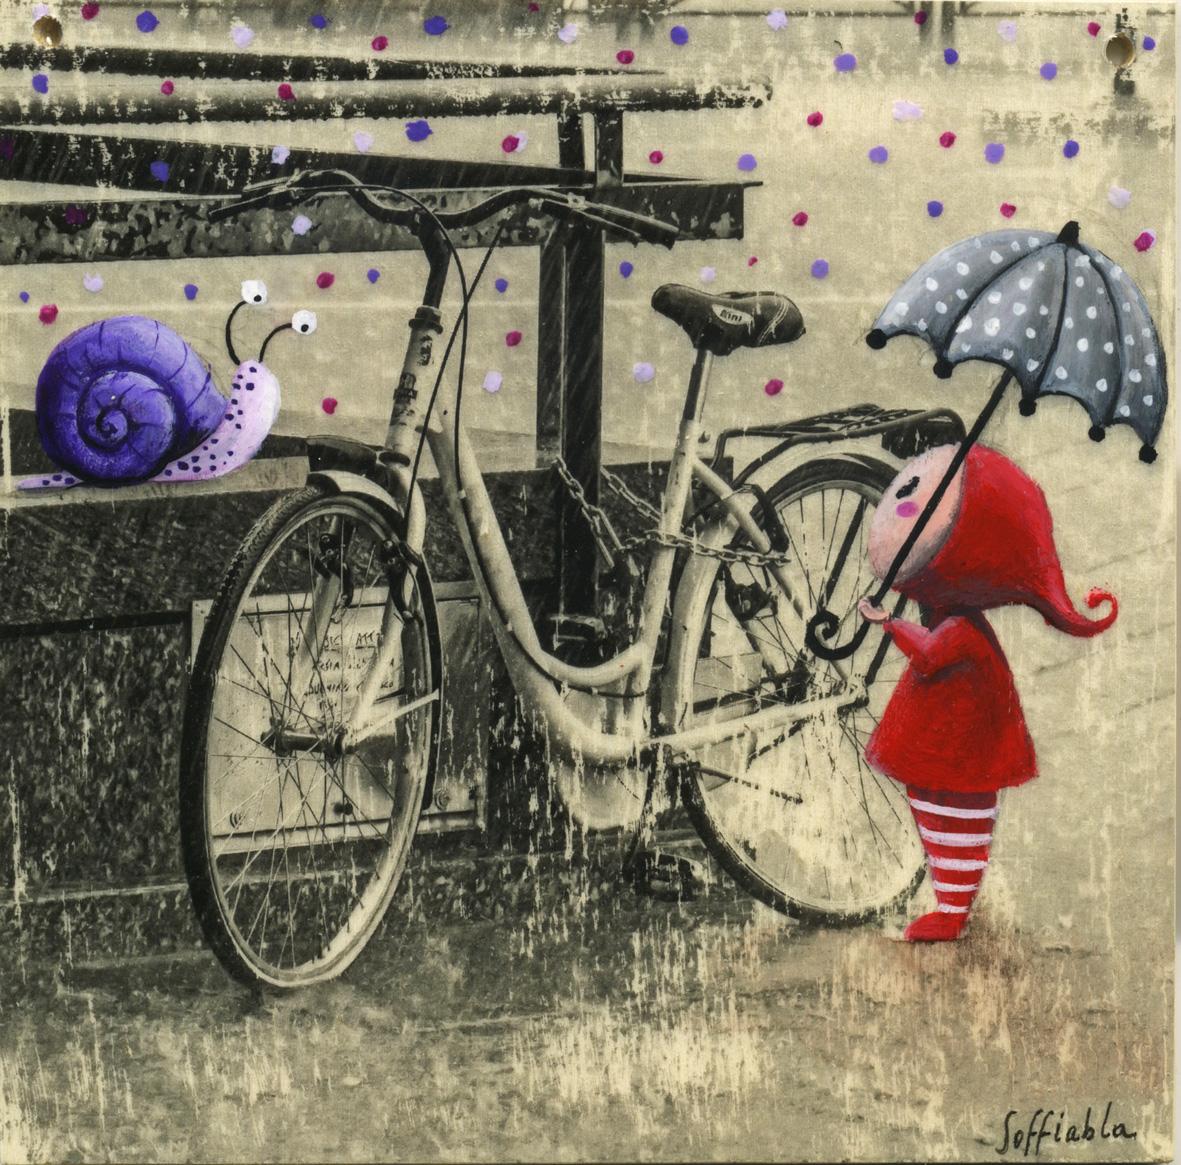 la bimba e la bici